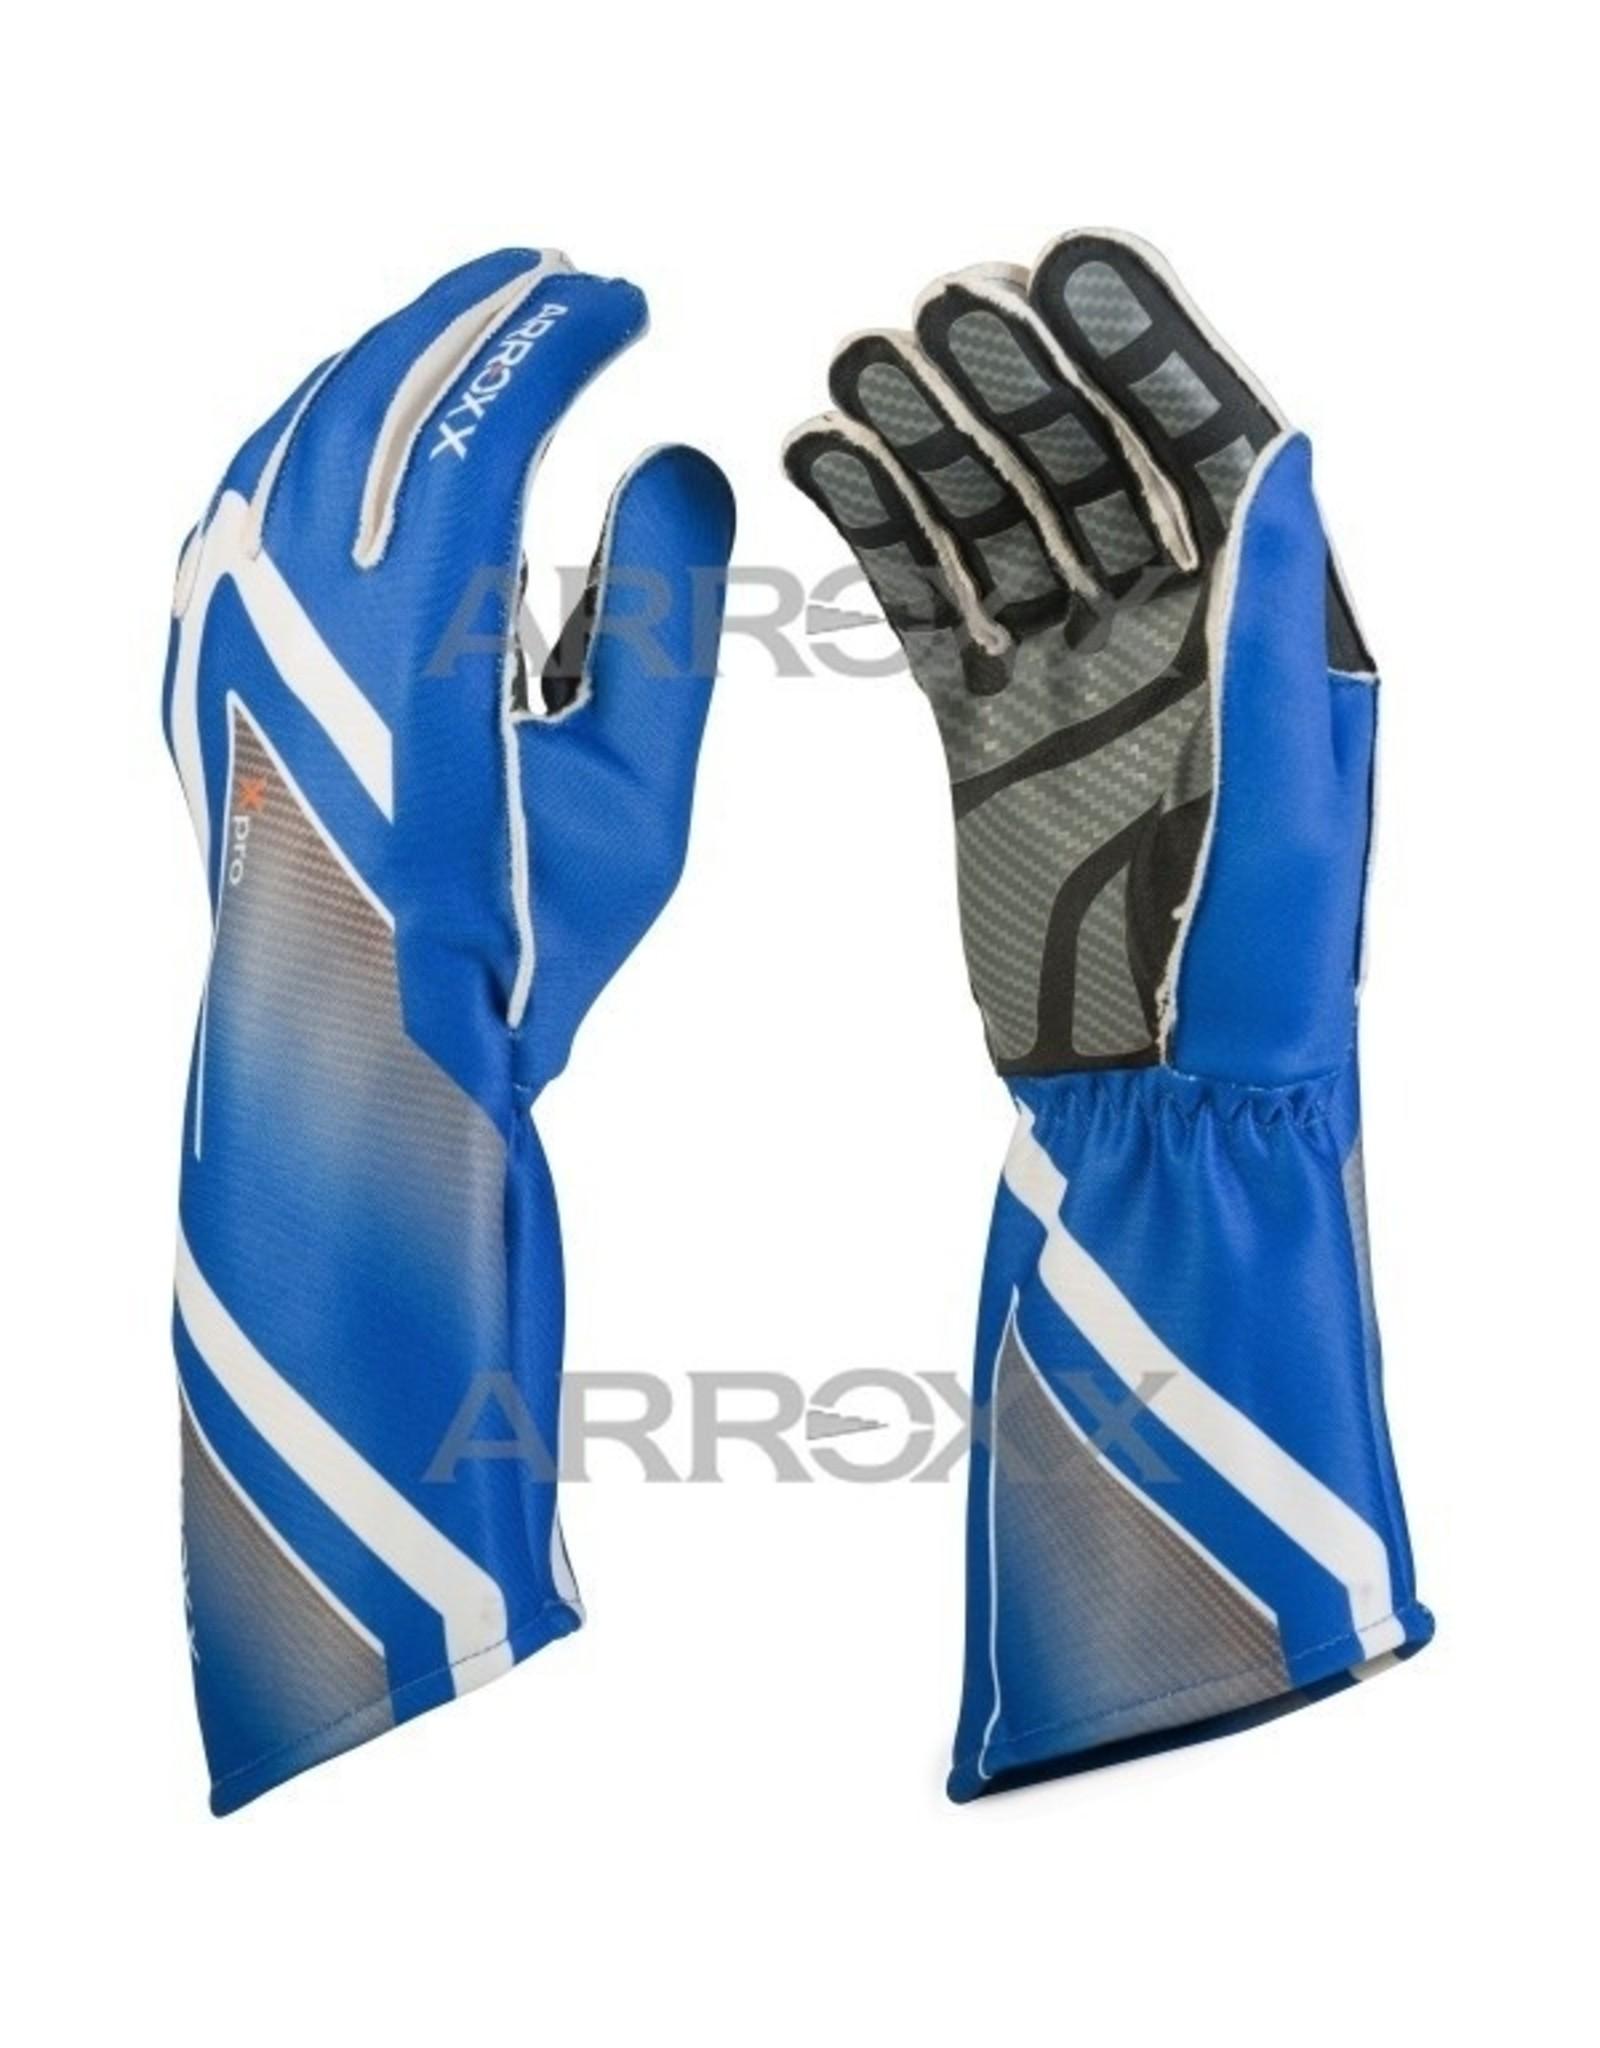 Arroxx Arroxx handschoenen Xpro blauw